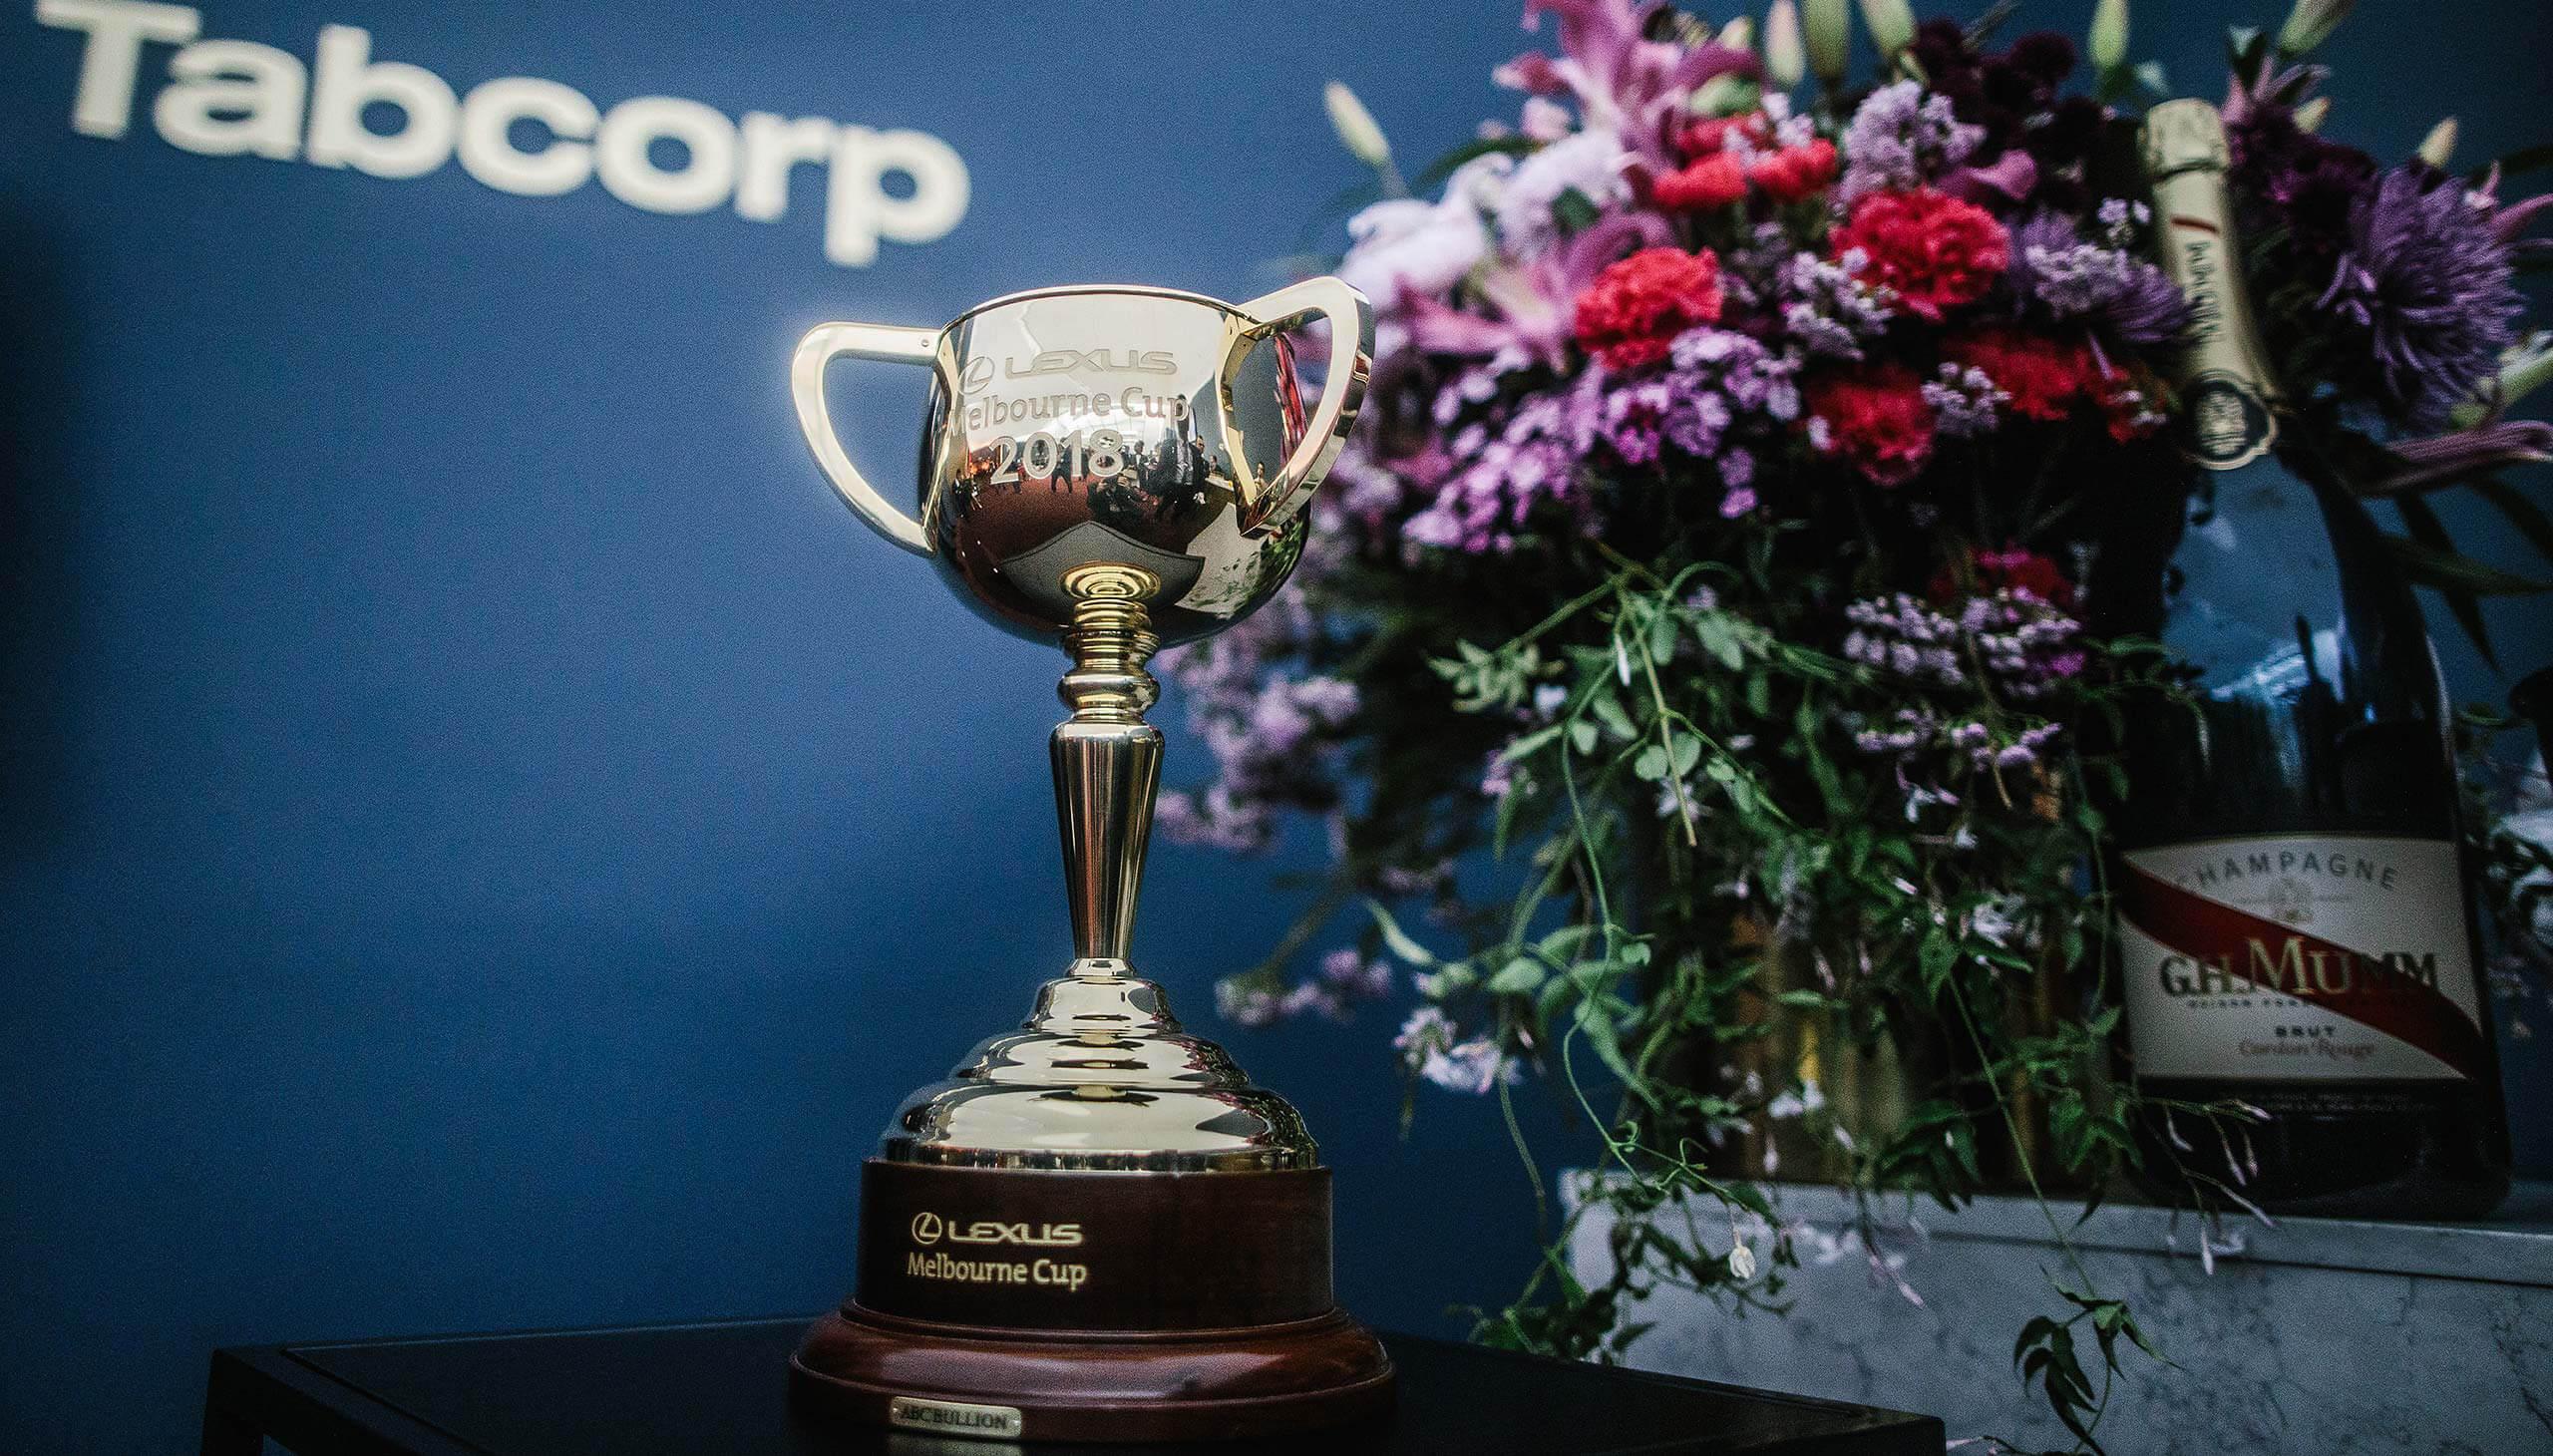 Melbourne Cup trophy